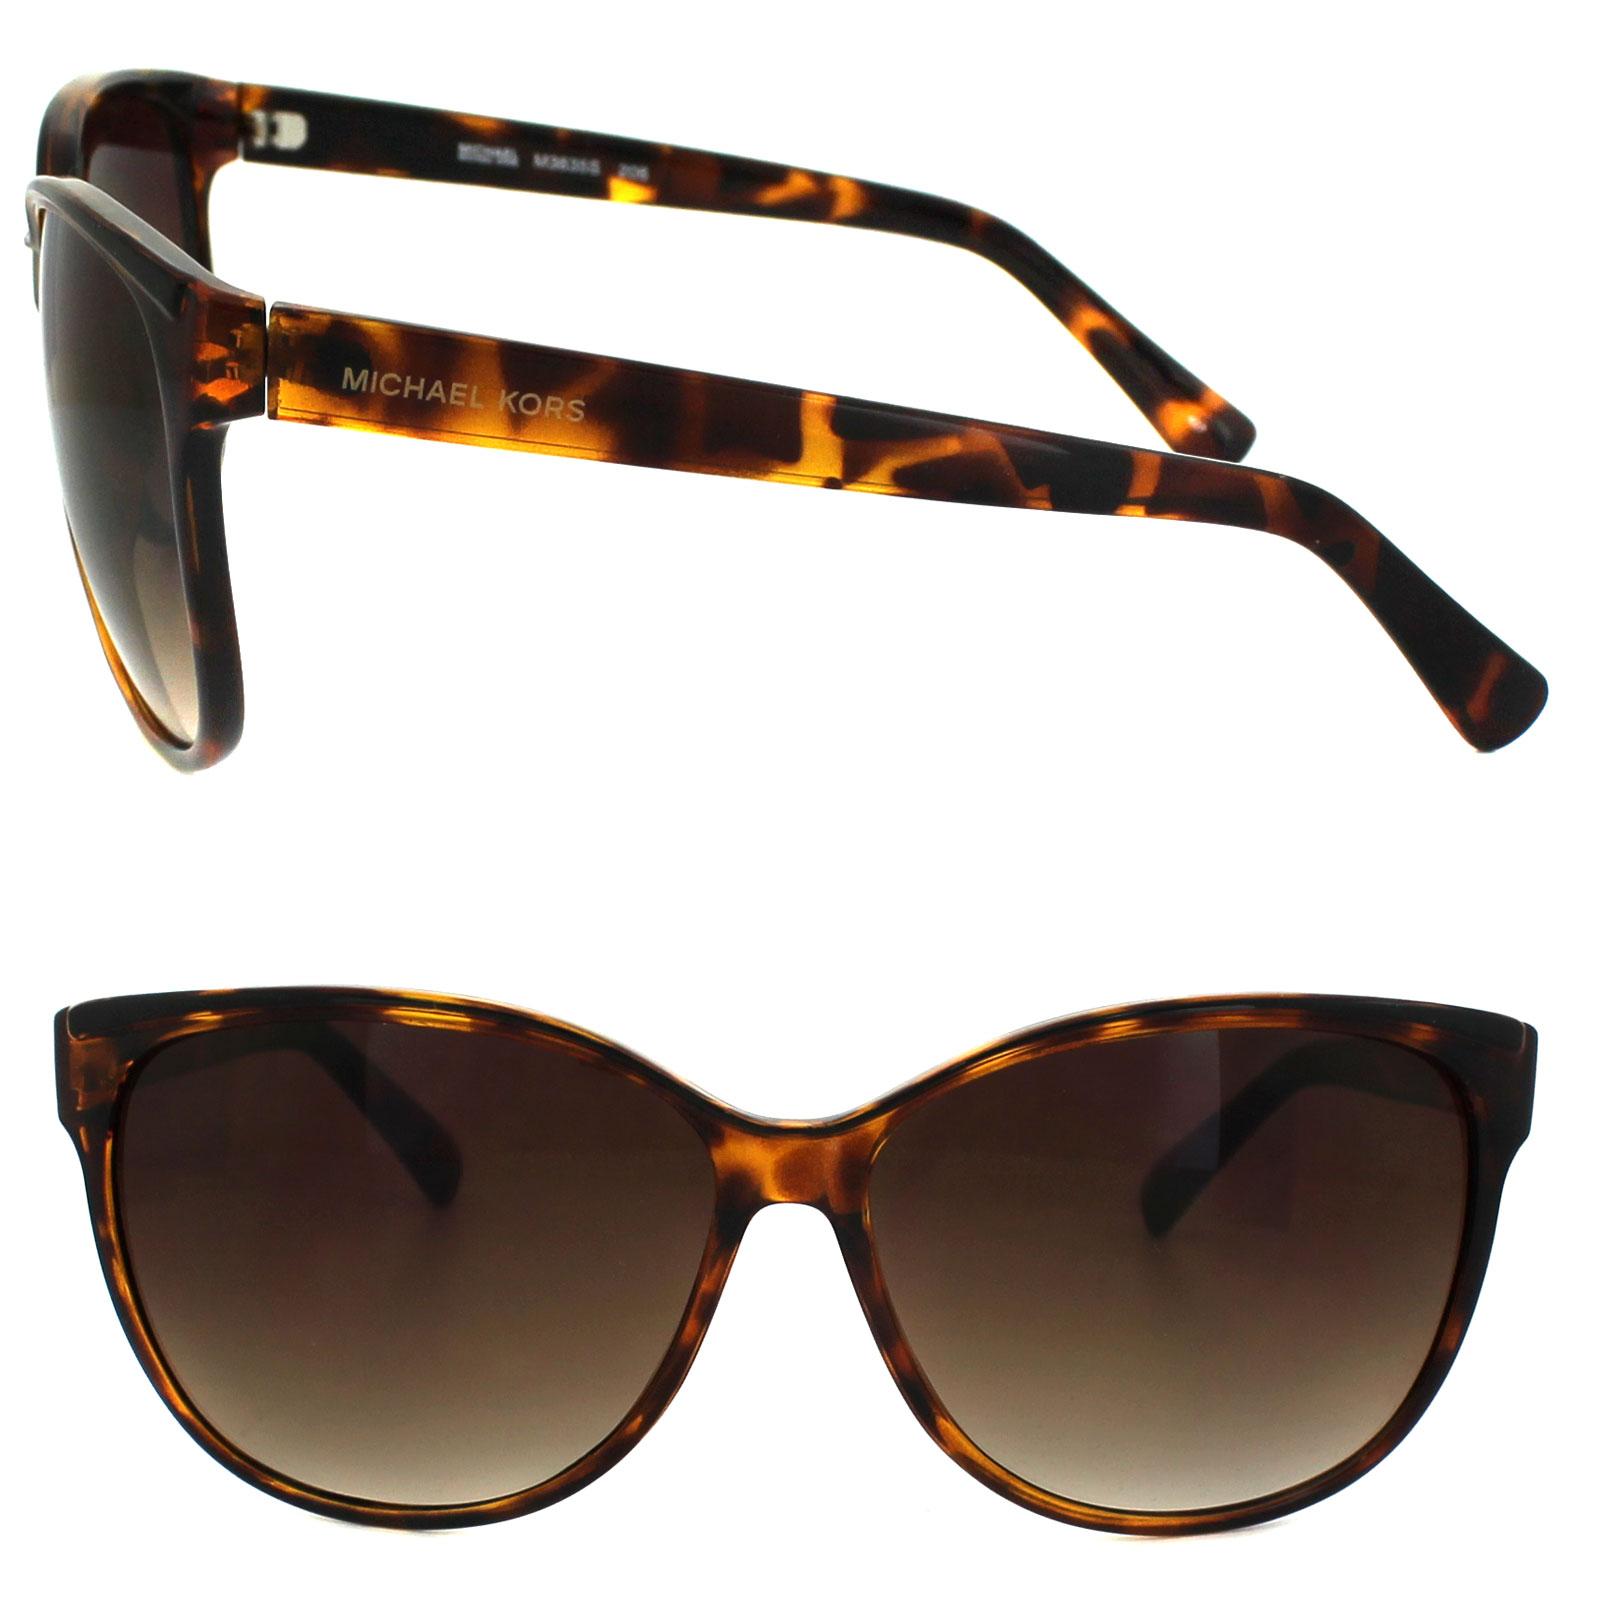 2097b98df1 ... 1 Michael Kors Sunglasses M3635S 206 Tortoise Brown Gradient Thumbnail 2  ...